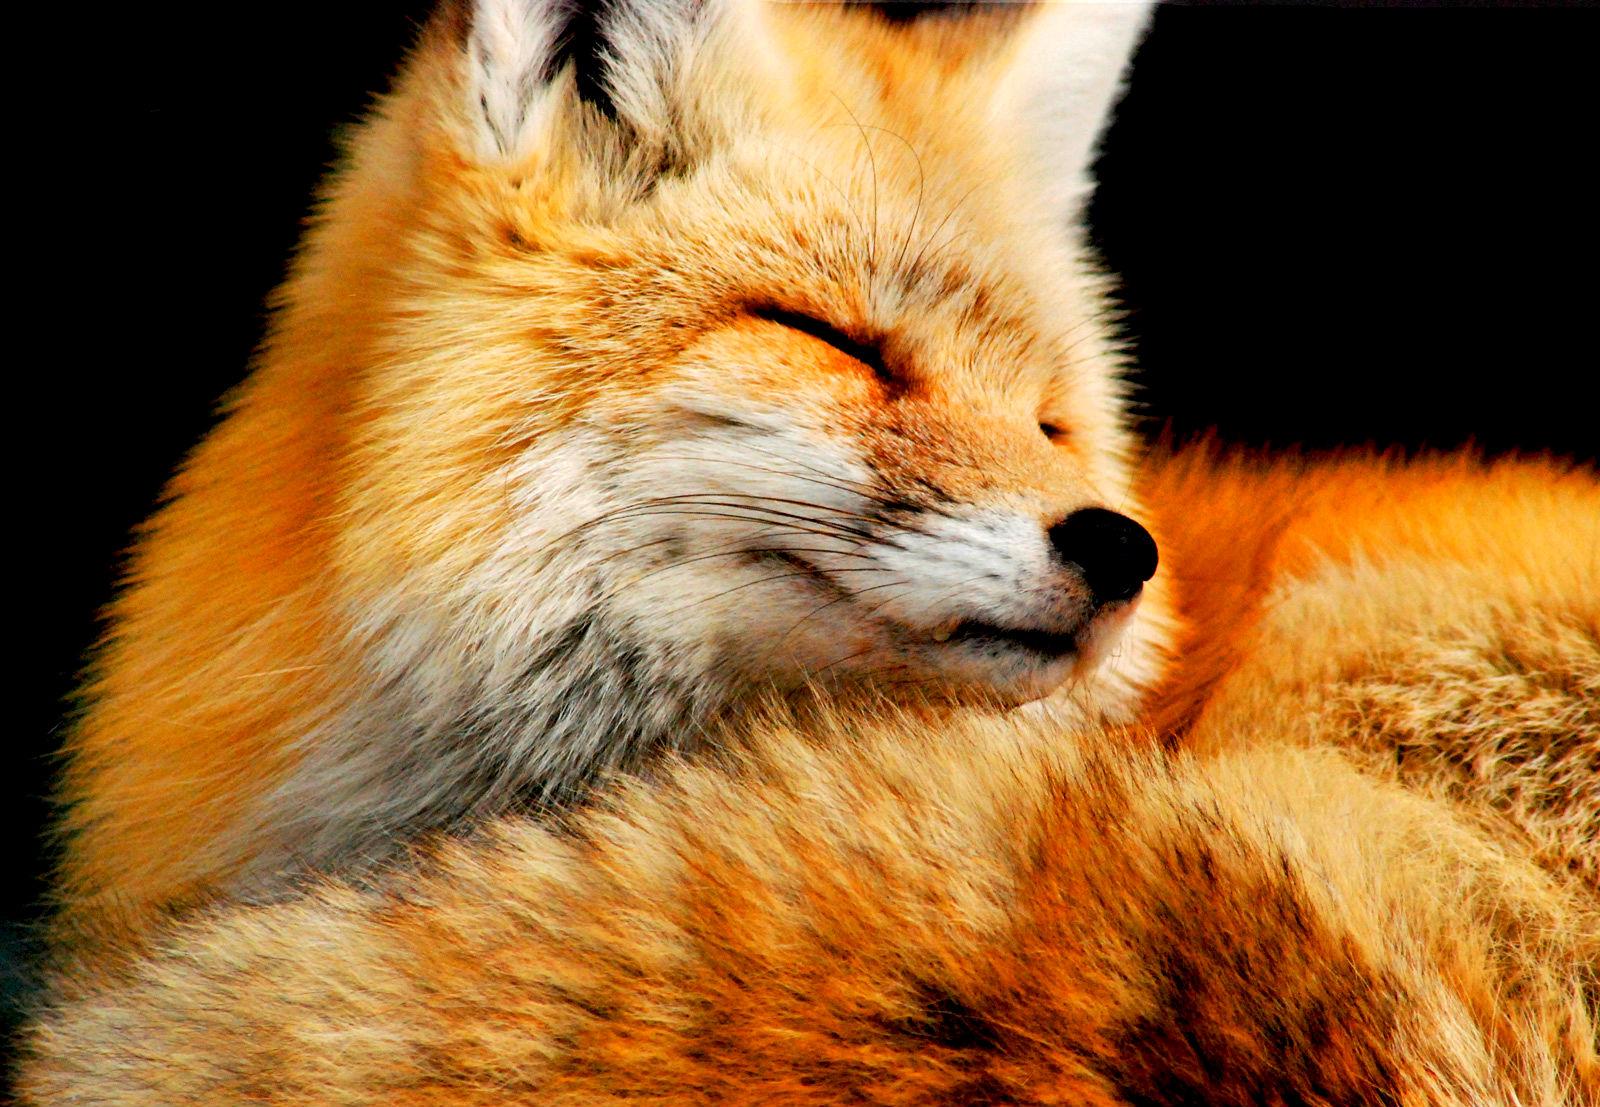 Fox desktop wallpaper wallpapersafari - Fox desktop background ...